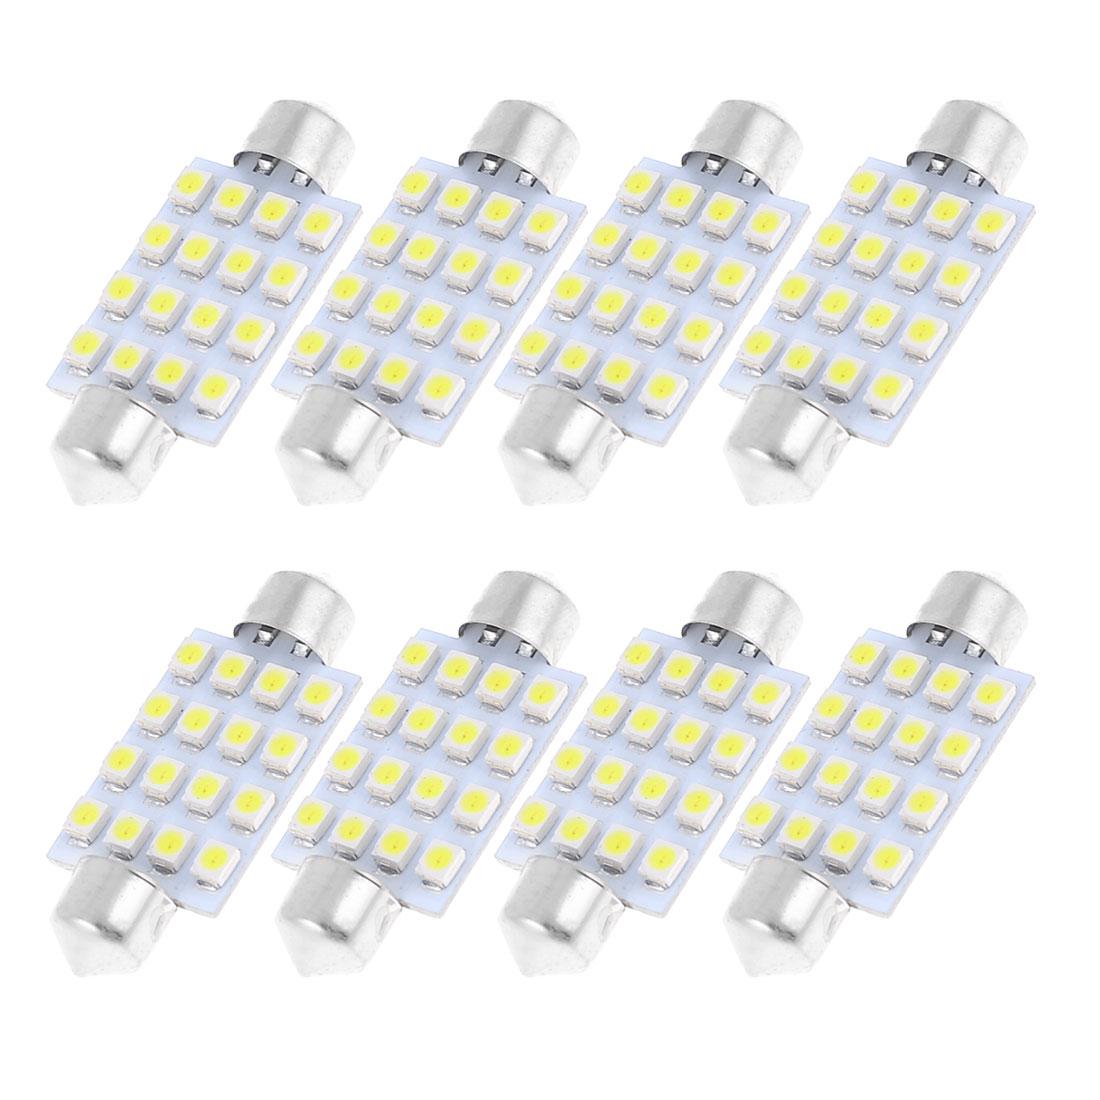 "8 Pcs 41mm 1.6"" 16-SMD LED White Festoon Dome Light Bulbs 211-2 212-2 569 578"